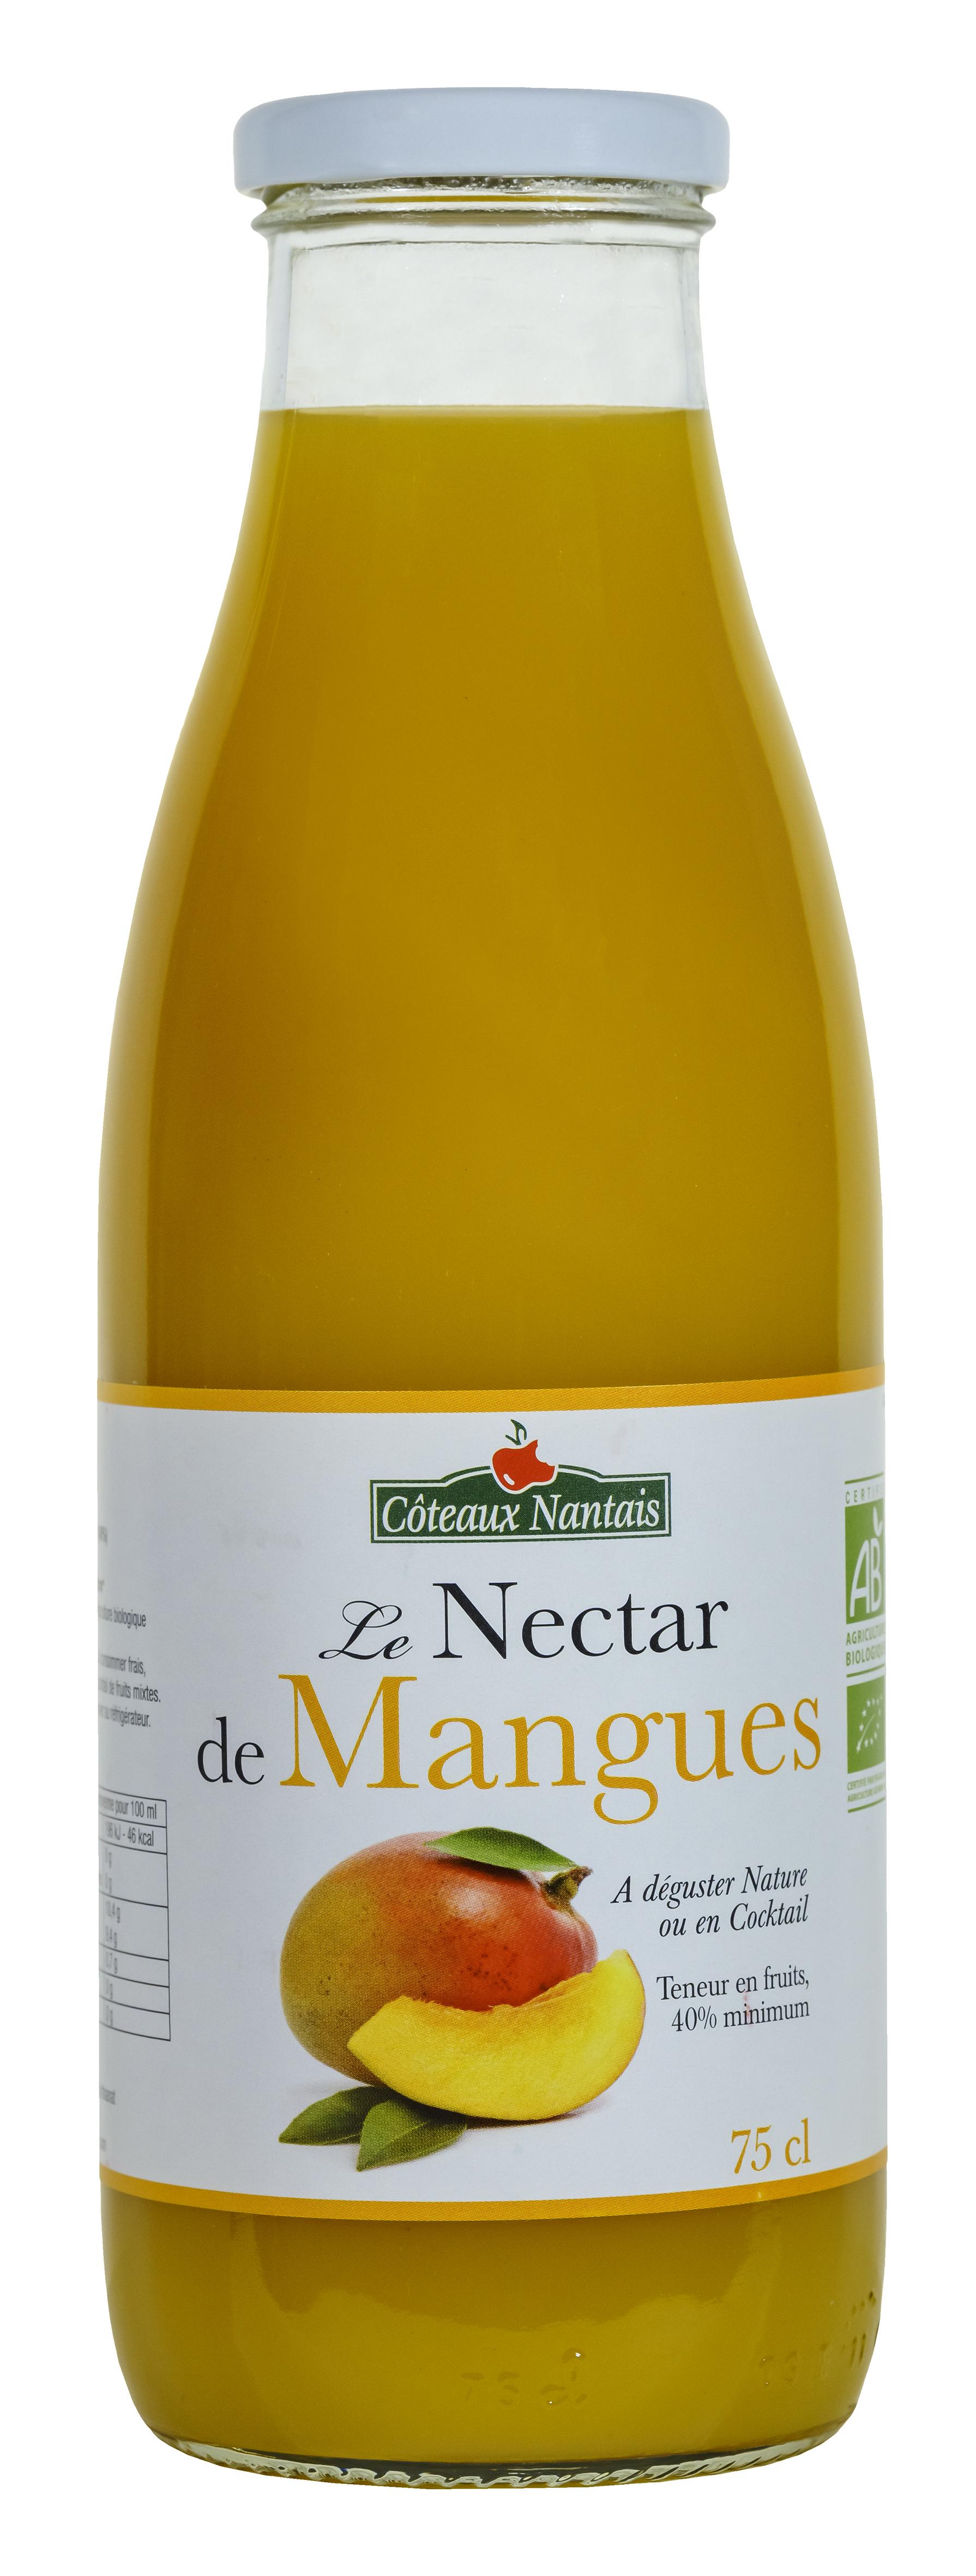 Nectar de mangues